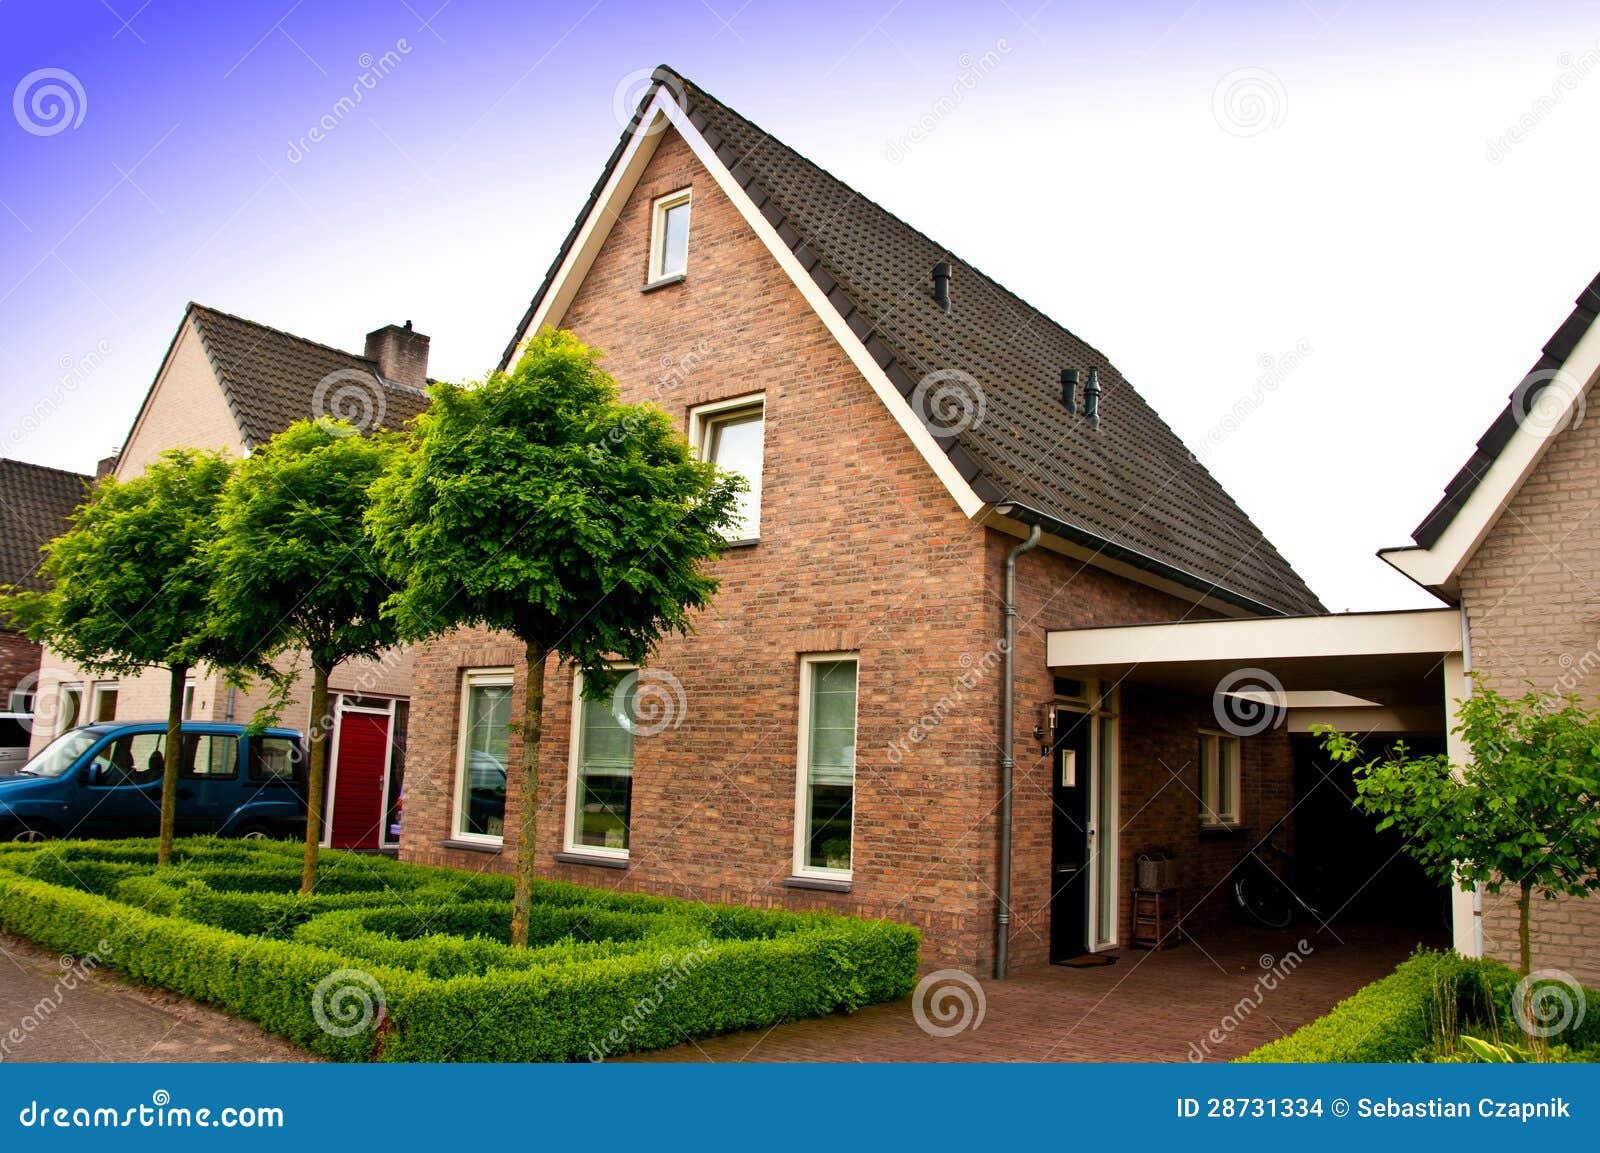 privates haus in holland stockbilder bild 28731334. Black Bedroom Furniture Sets. Home Design Ideas